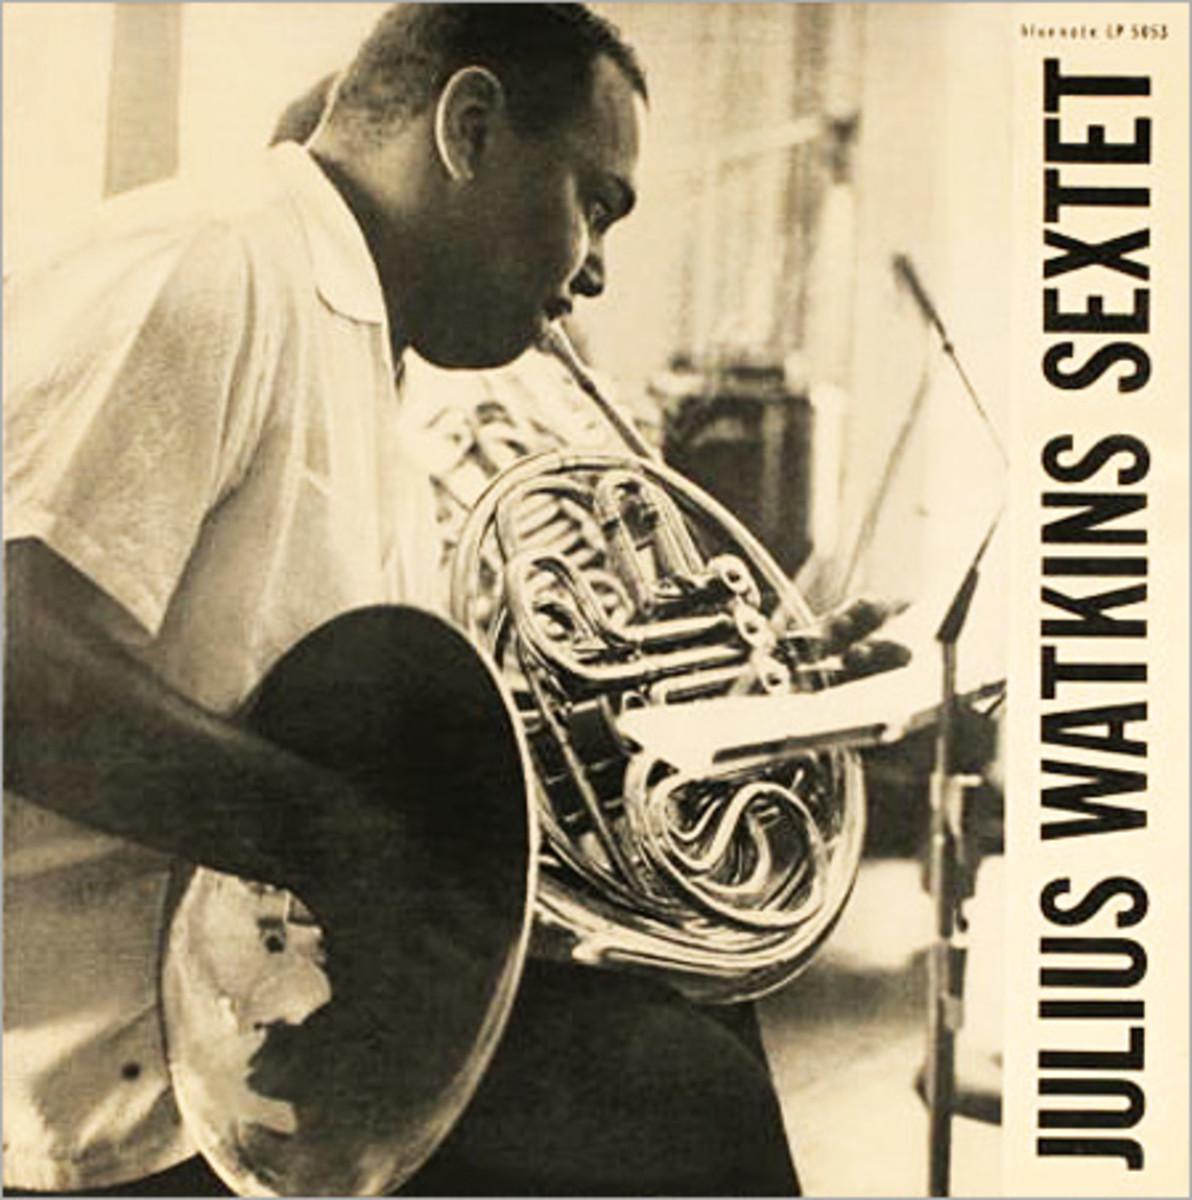 "Julius Watkins ""Julius Watkins Sextet"" Blue Note Records BLP 5053 10"" LP Vinyl Microgroove Record (1955) Album Cover Design and Photo by Bill Hughes"